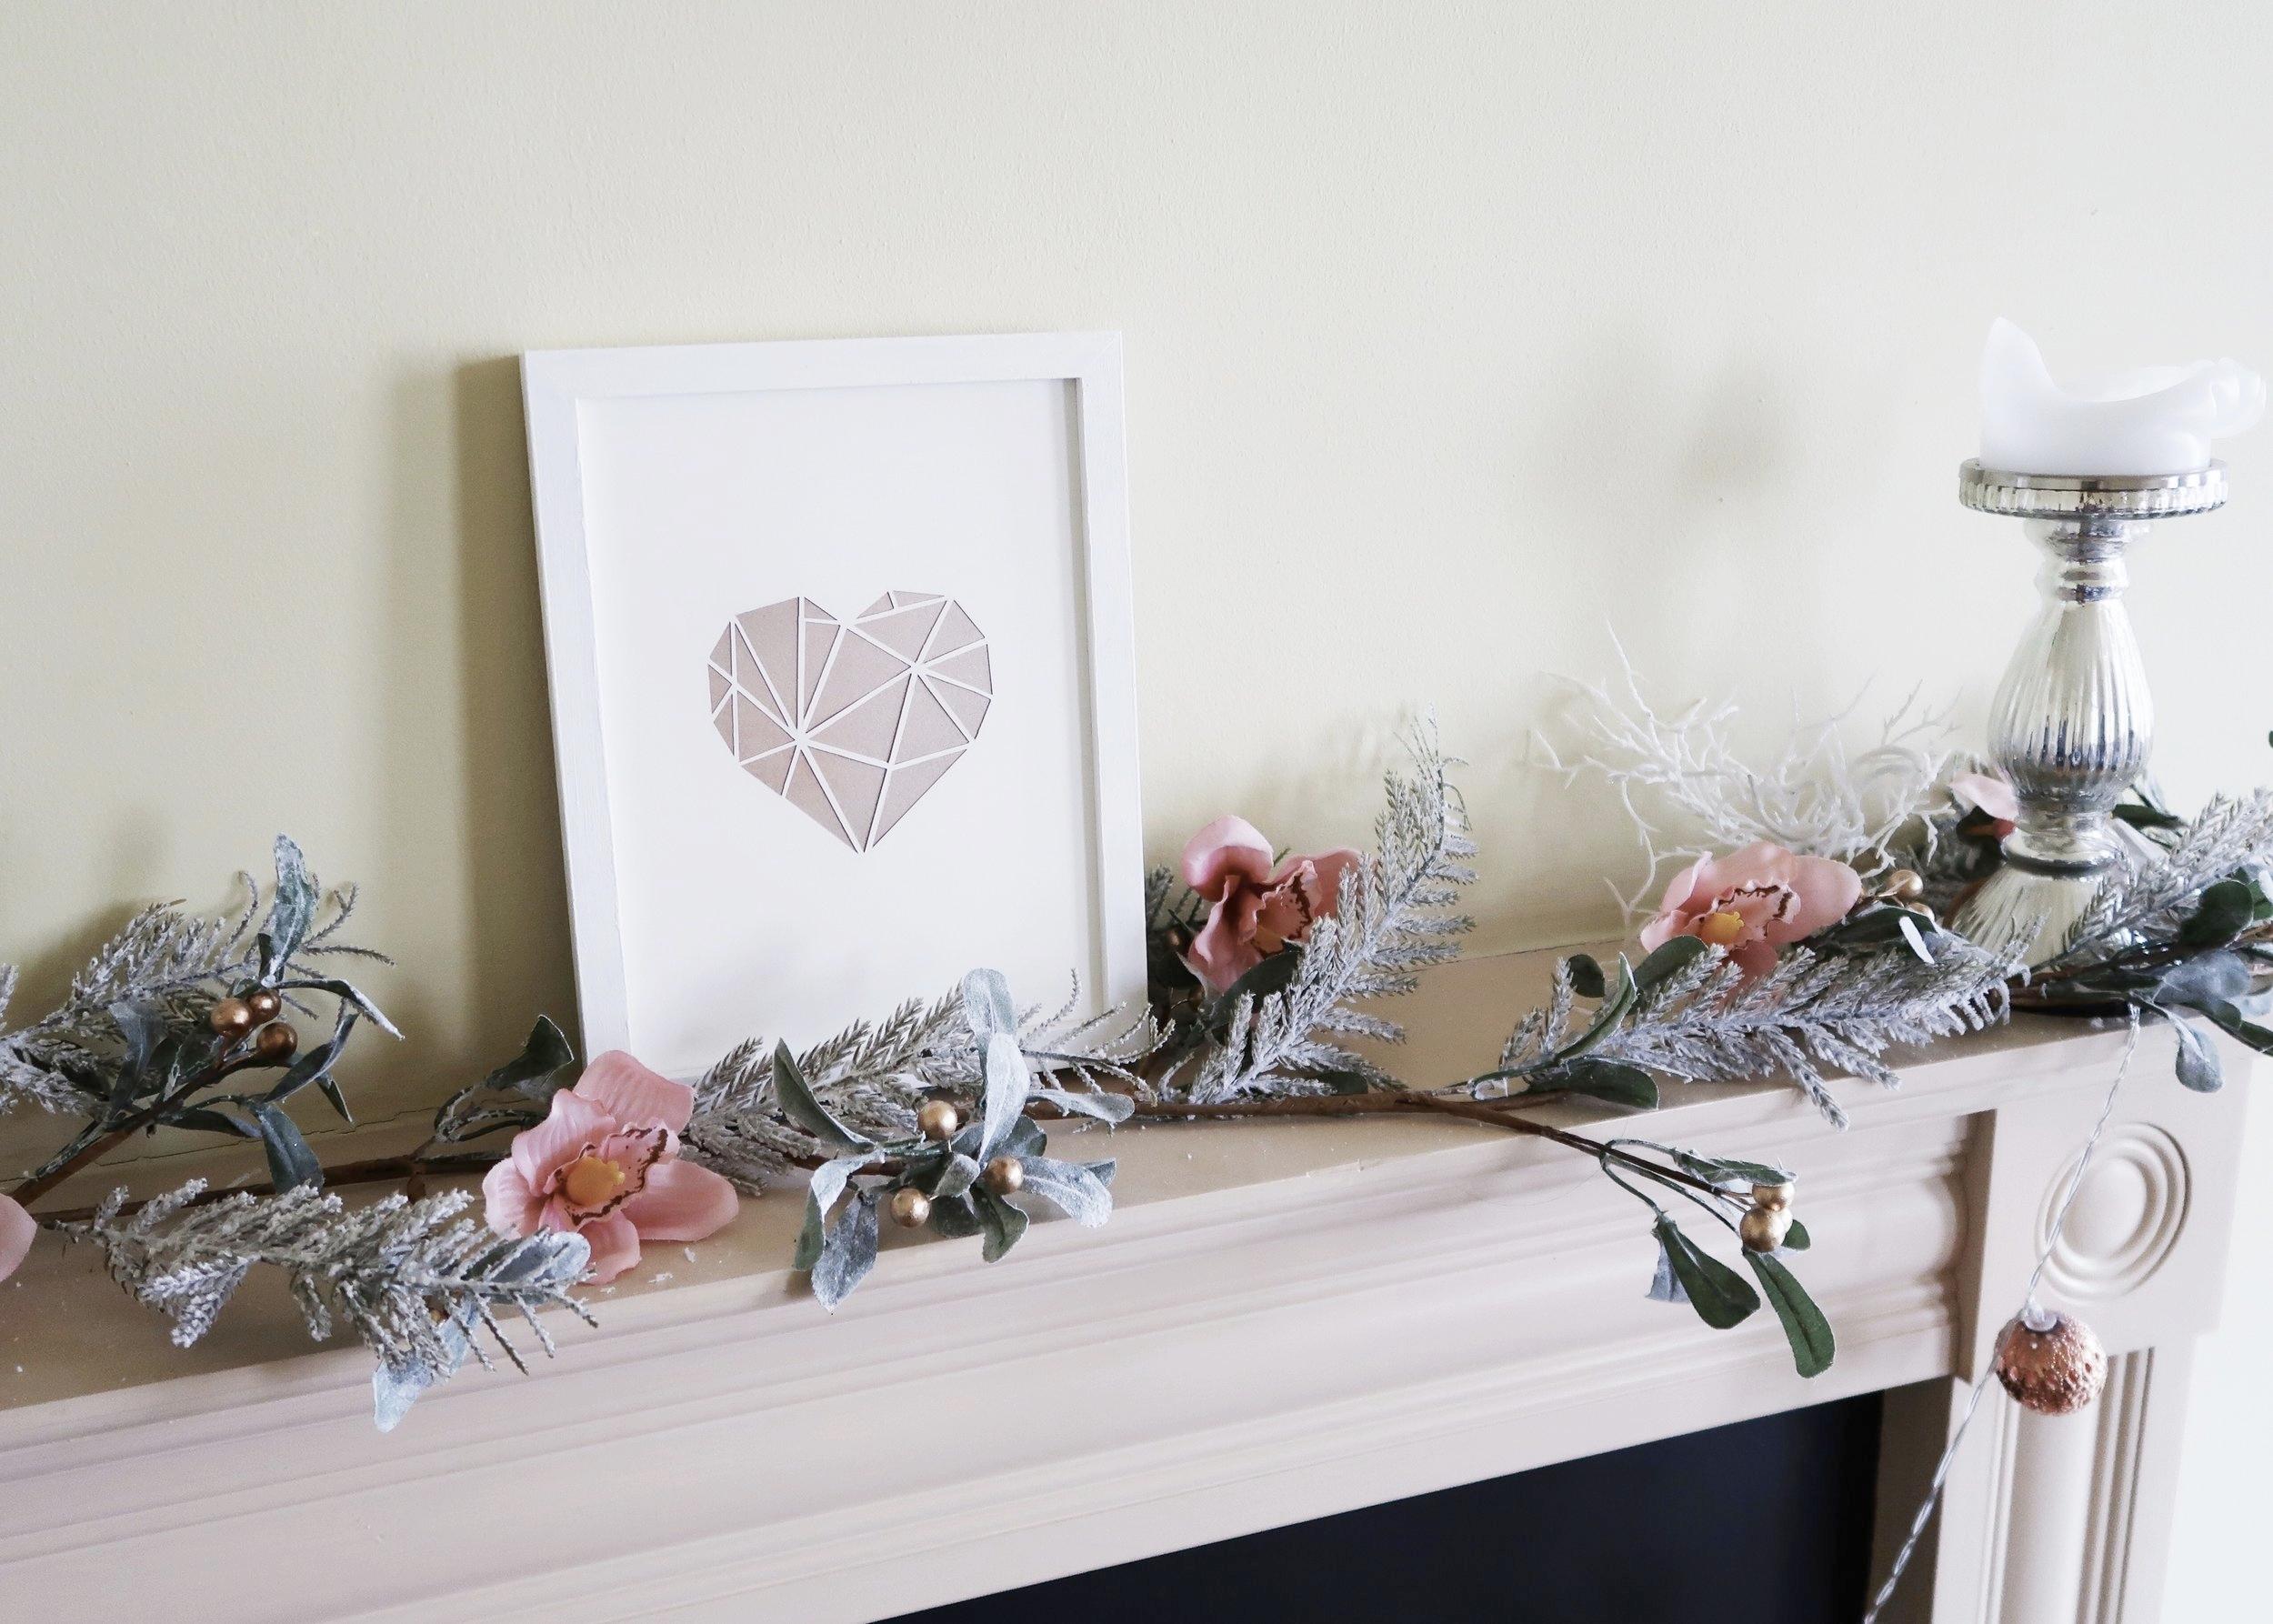 DIY Paper-cut Heart Wall Art by Isoscella